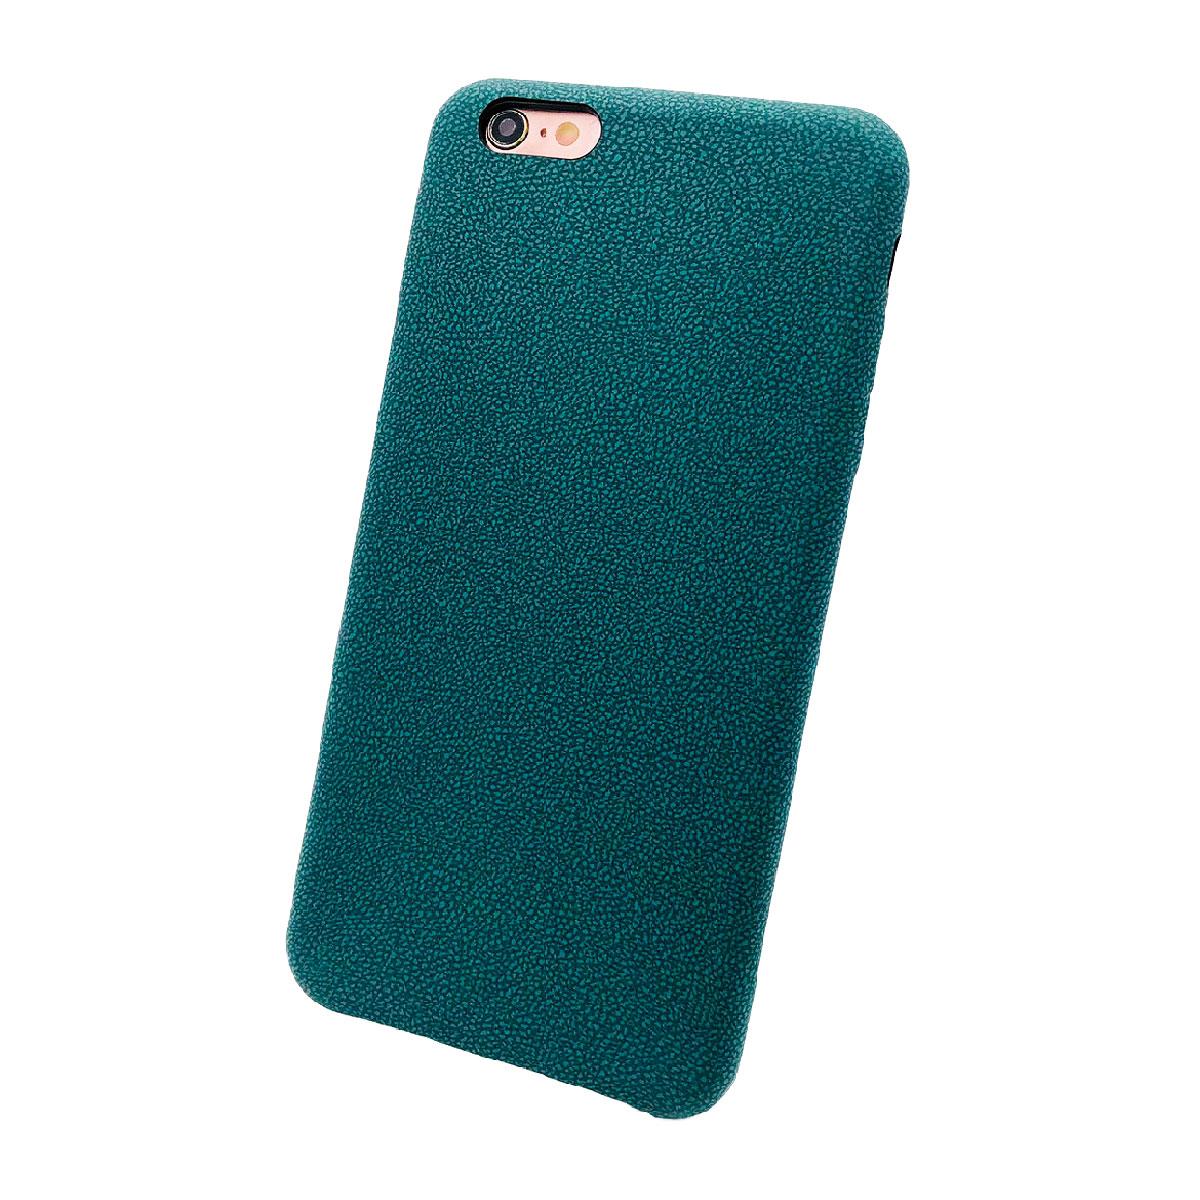 coque iphone 6 effet cuir